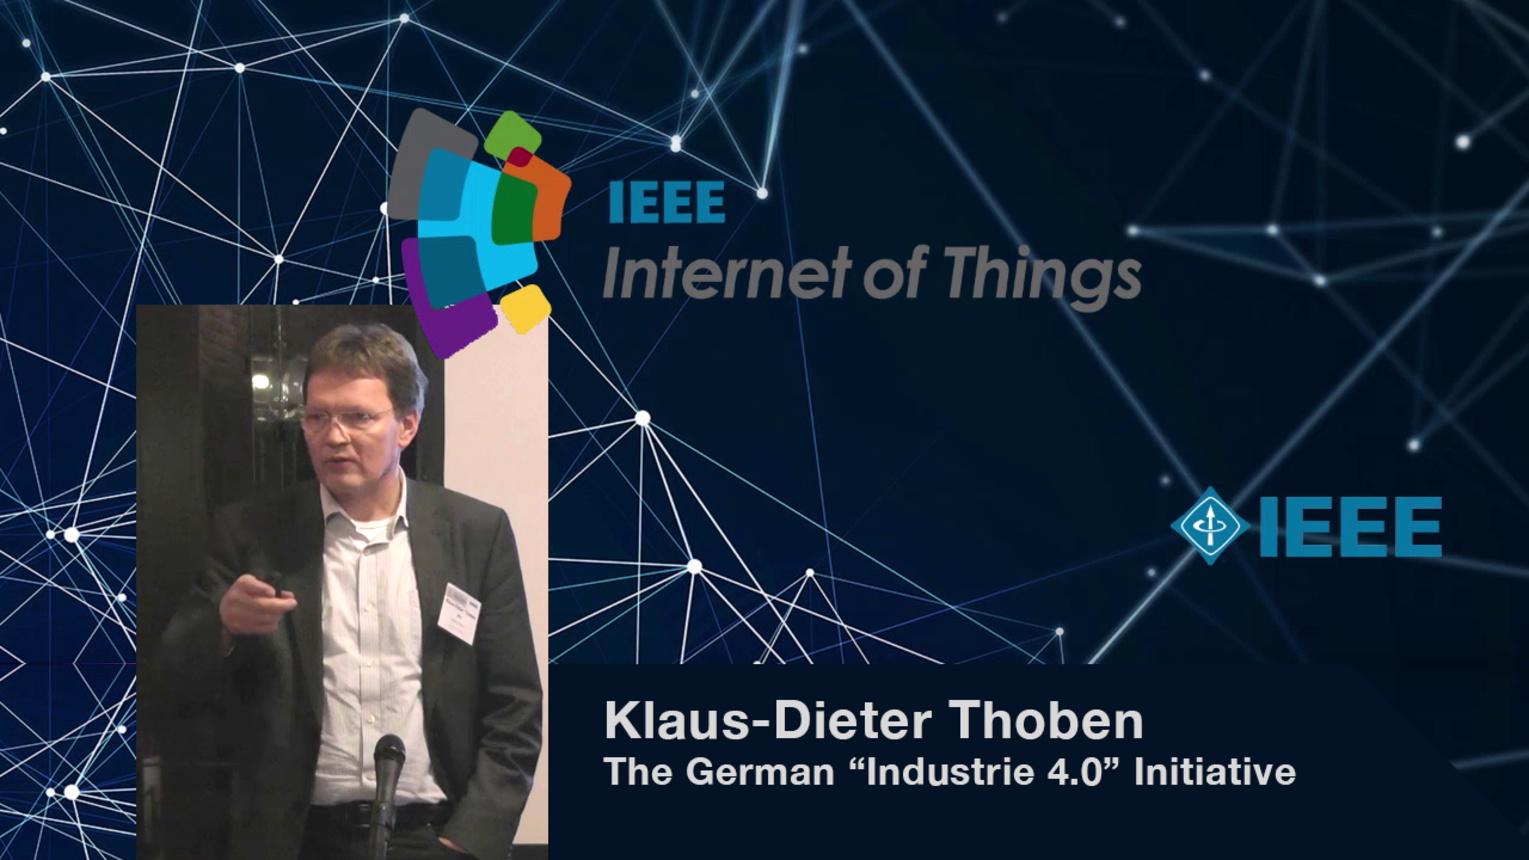 Klaus-Dieter Thoben: The German Industrie 4.0 Initiative - WF-IoT 2015